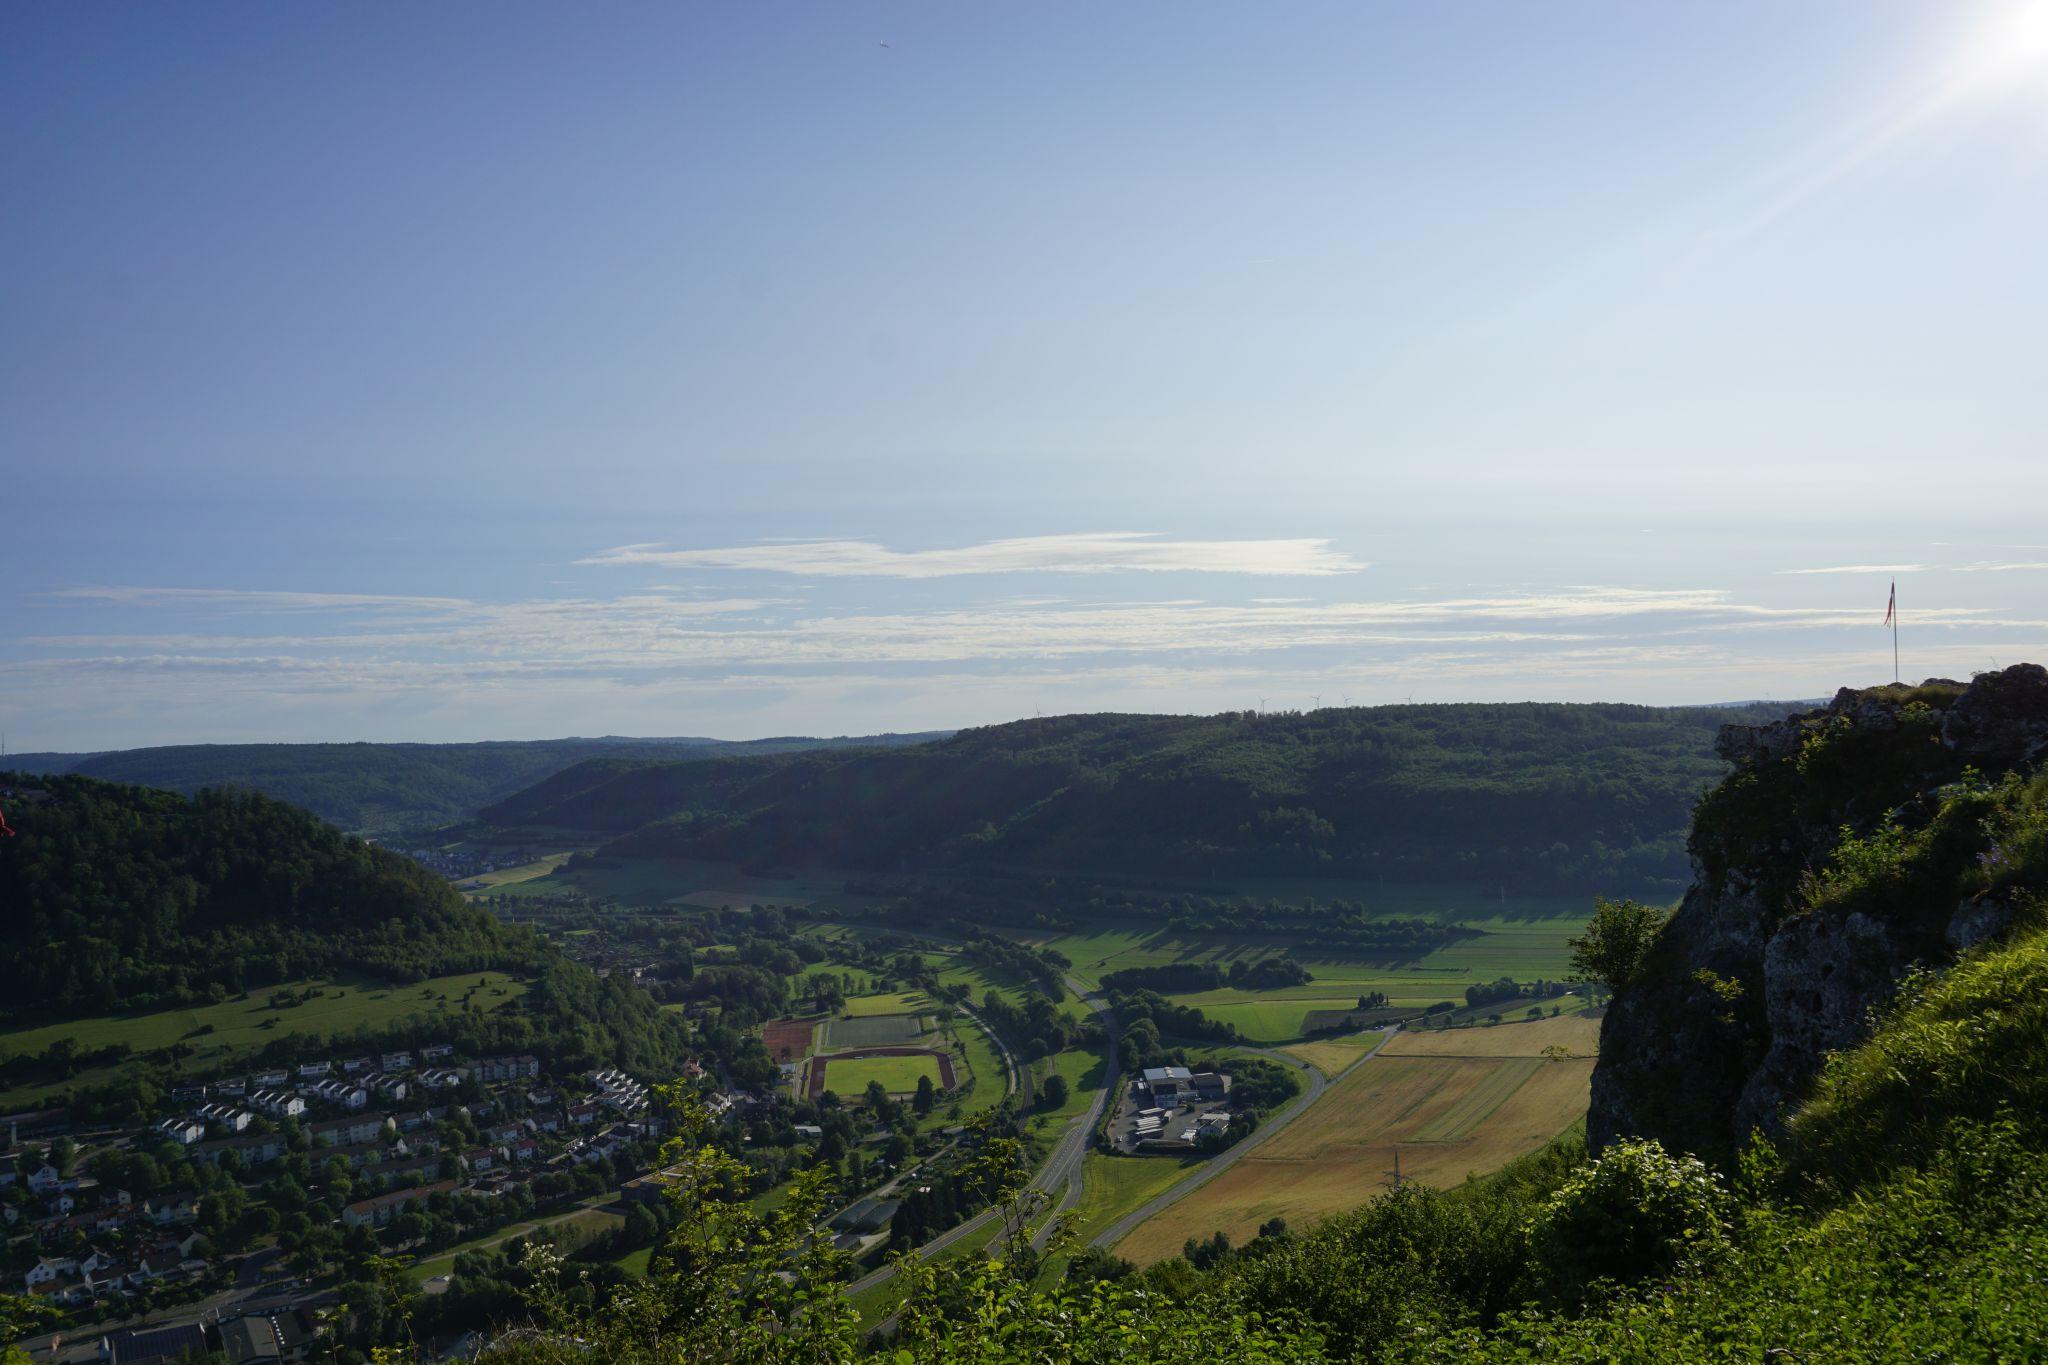 Rodstein, Germany